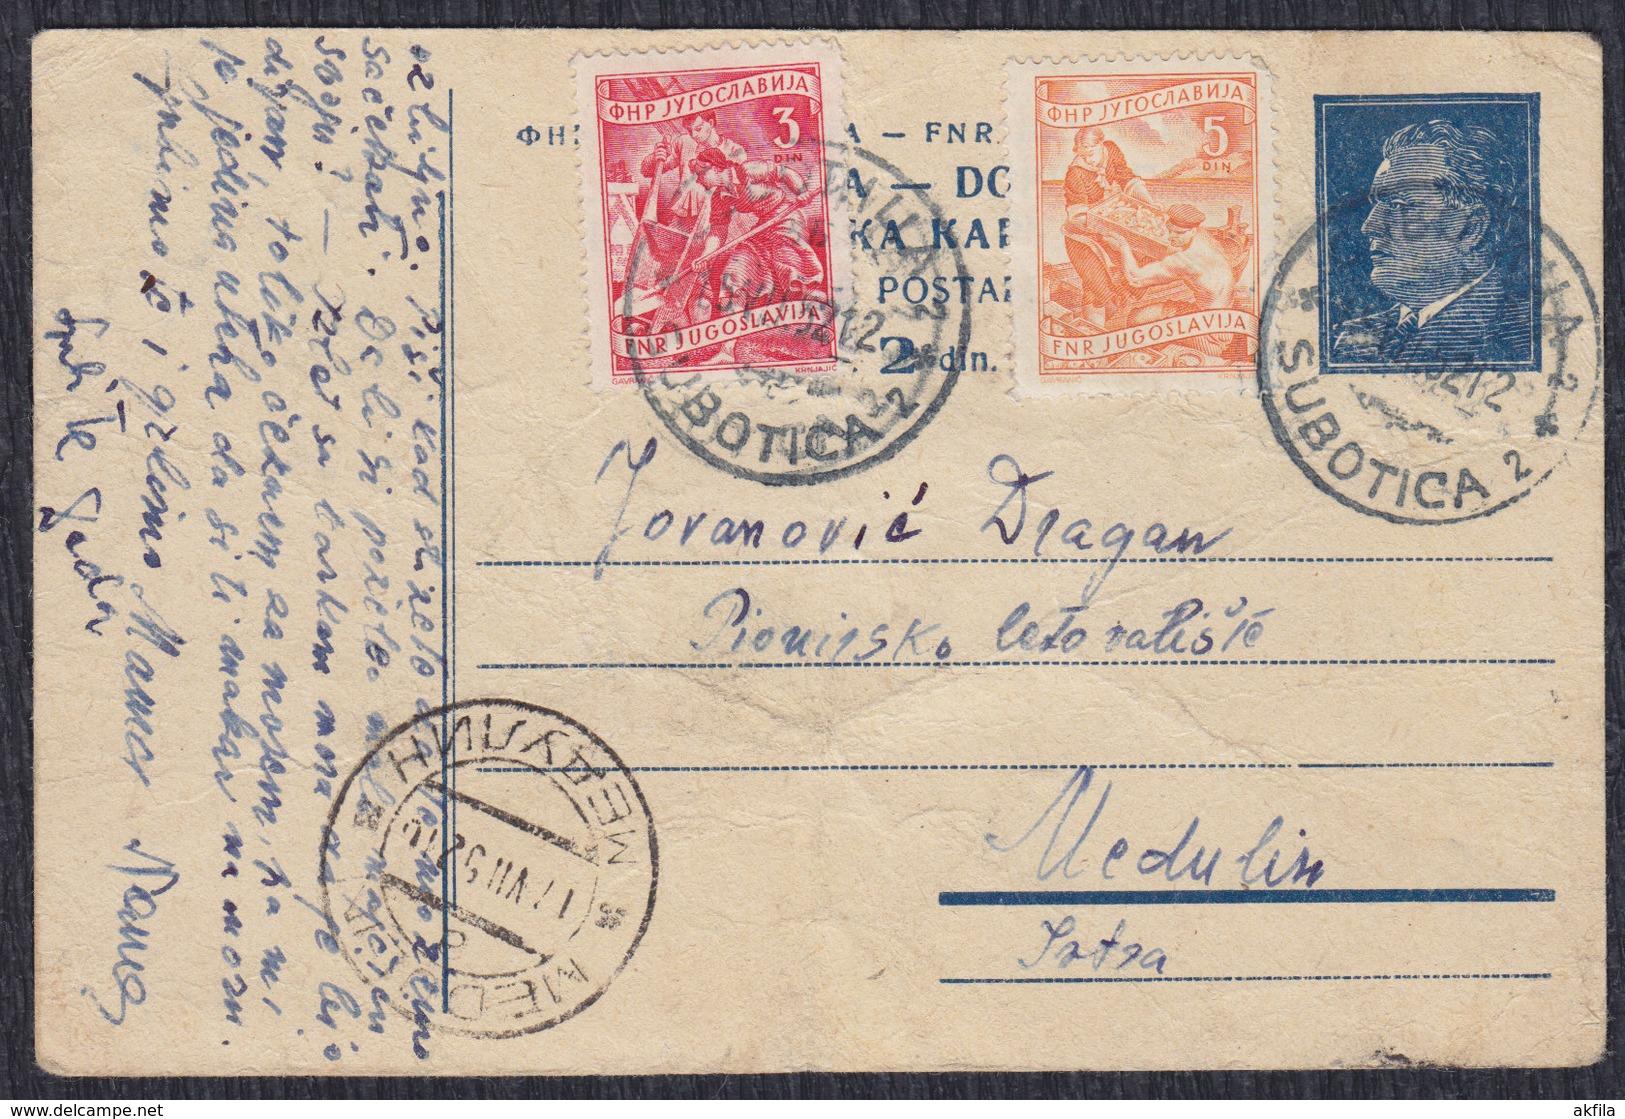 Yugoslavia 1952 Marshal Tito Postal Stationery Sent From Subotica To Medulin (week Condition) - Ganzsachen